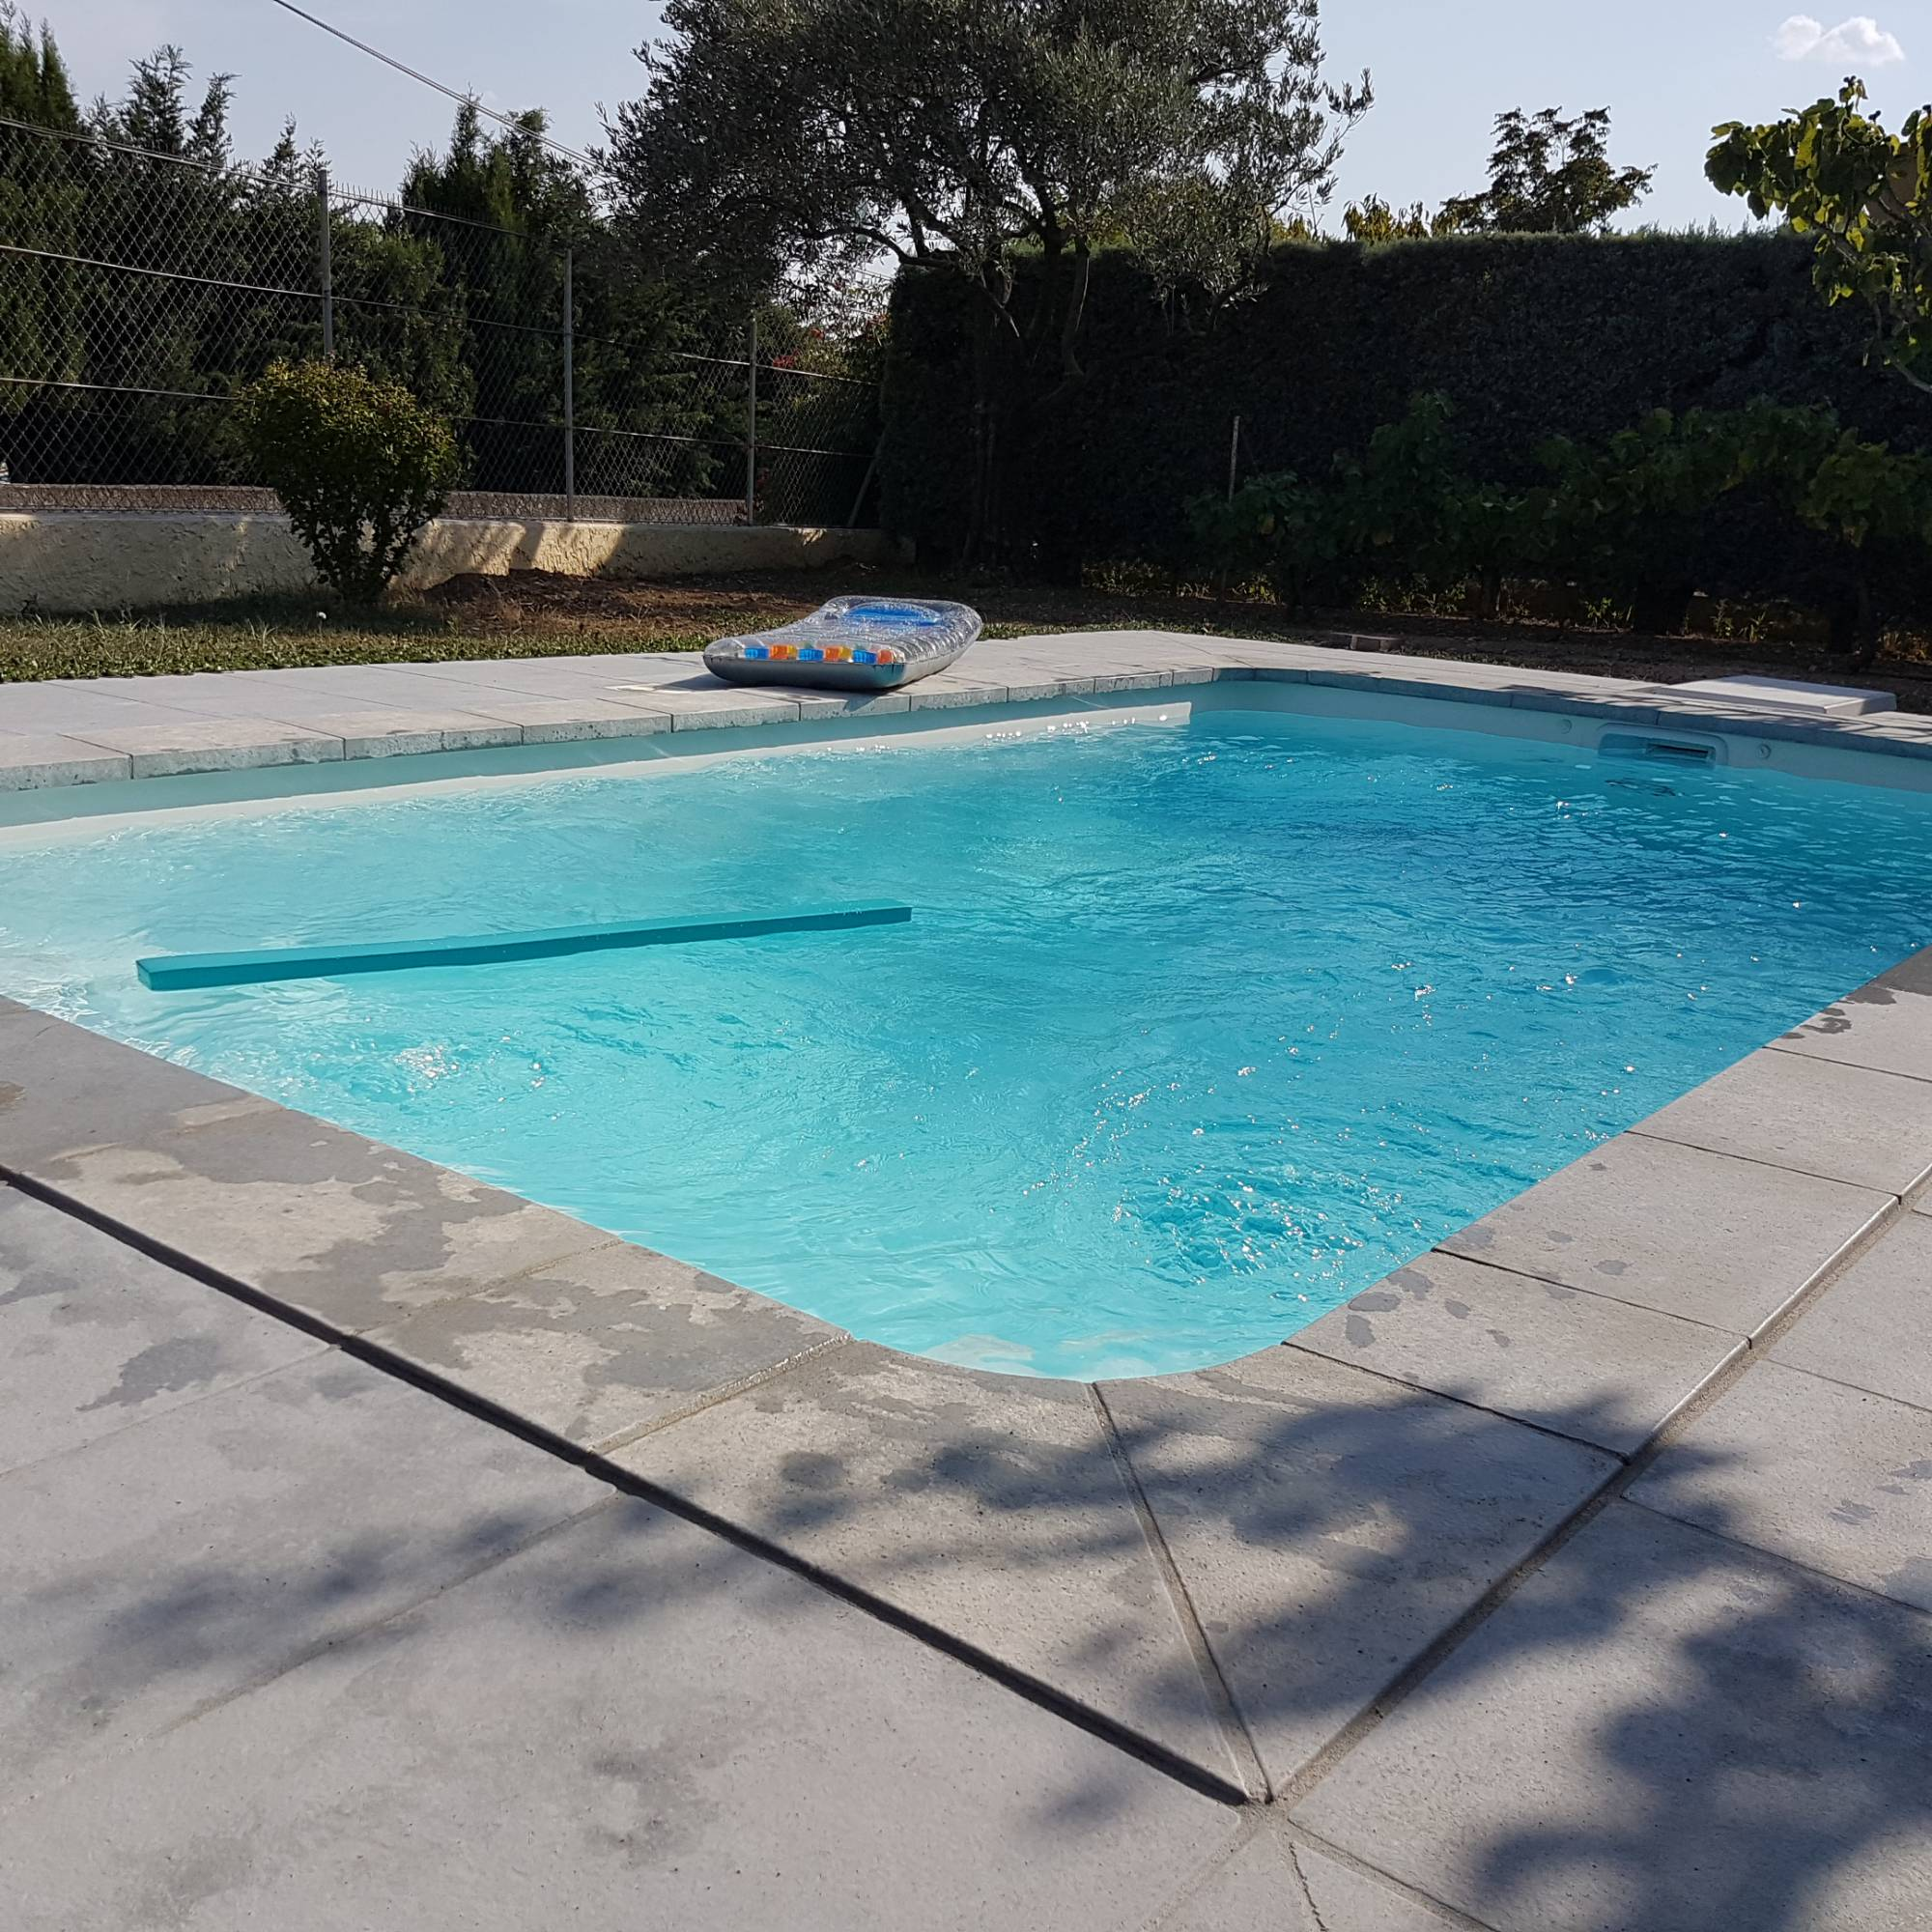 vente de piscines france piscines composites coque polyester marseille ferr piscines. Black Bedroom Furniture Sets. Home Design Ideas